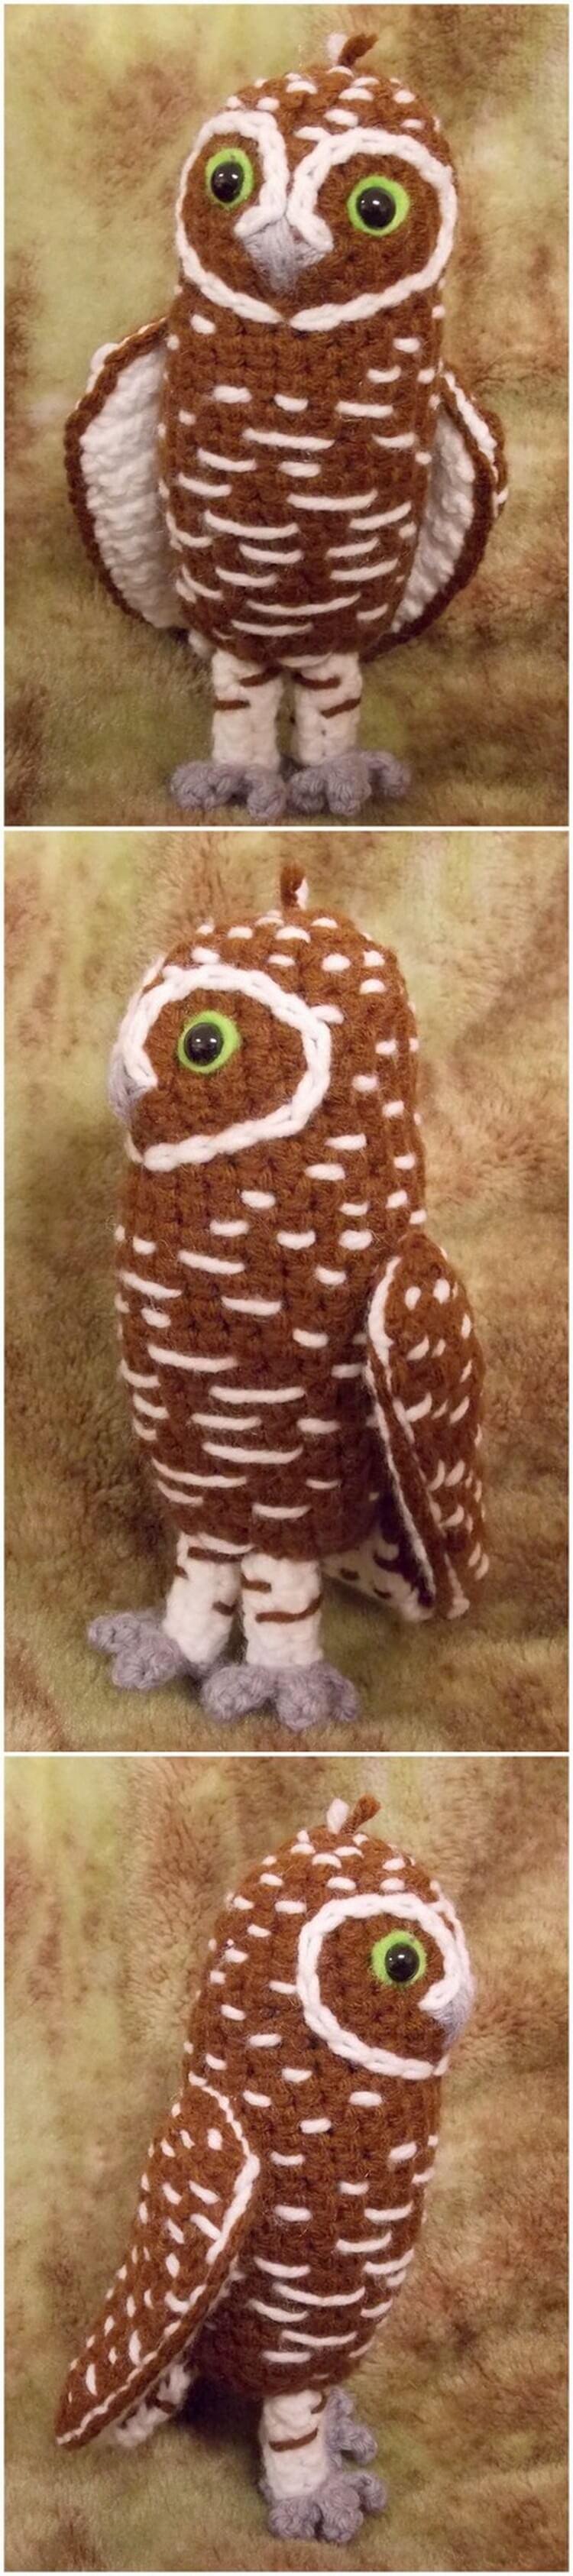 Crochet Amigurumi Pattern (9)